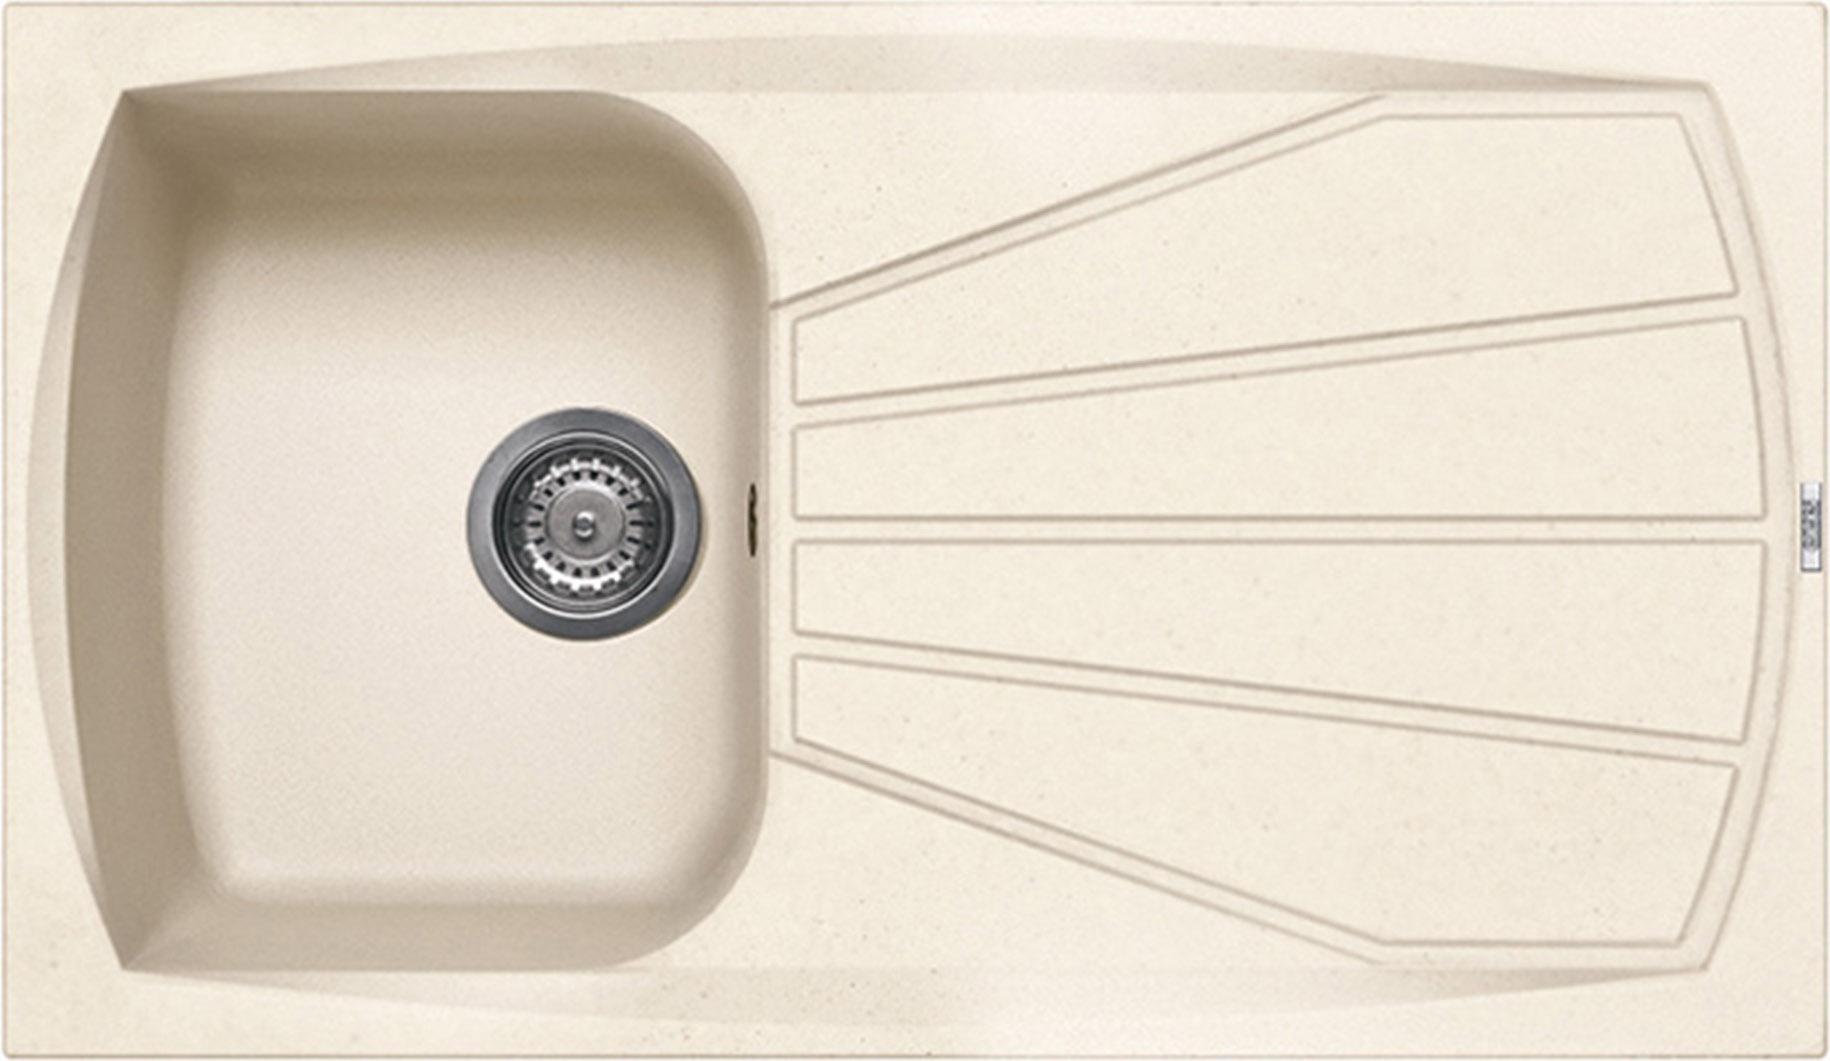 Lavello Cucina 1 Vasca Incasso eff Fragranite ELLECI 86 cm Avena LGL40051NNA  eBay